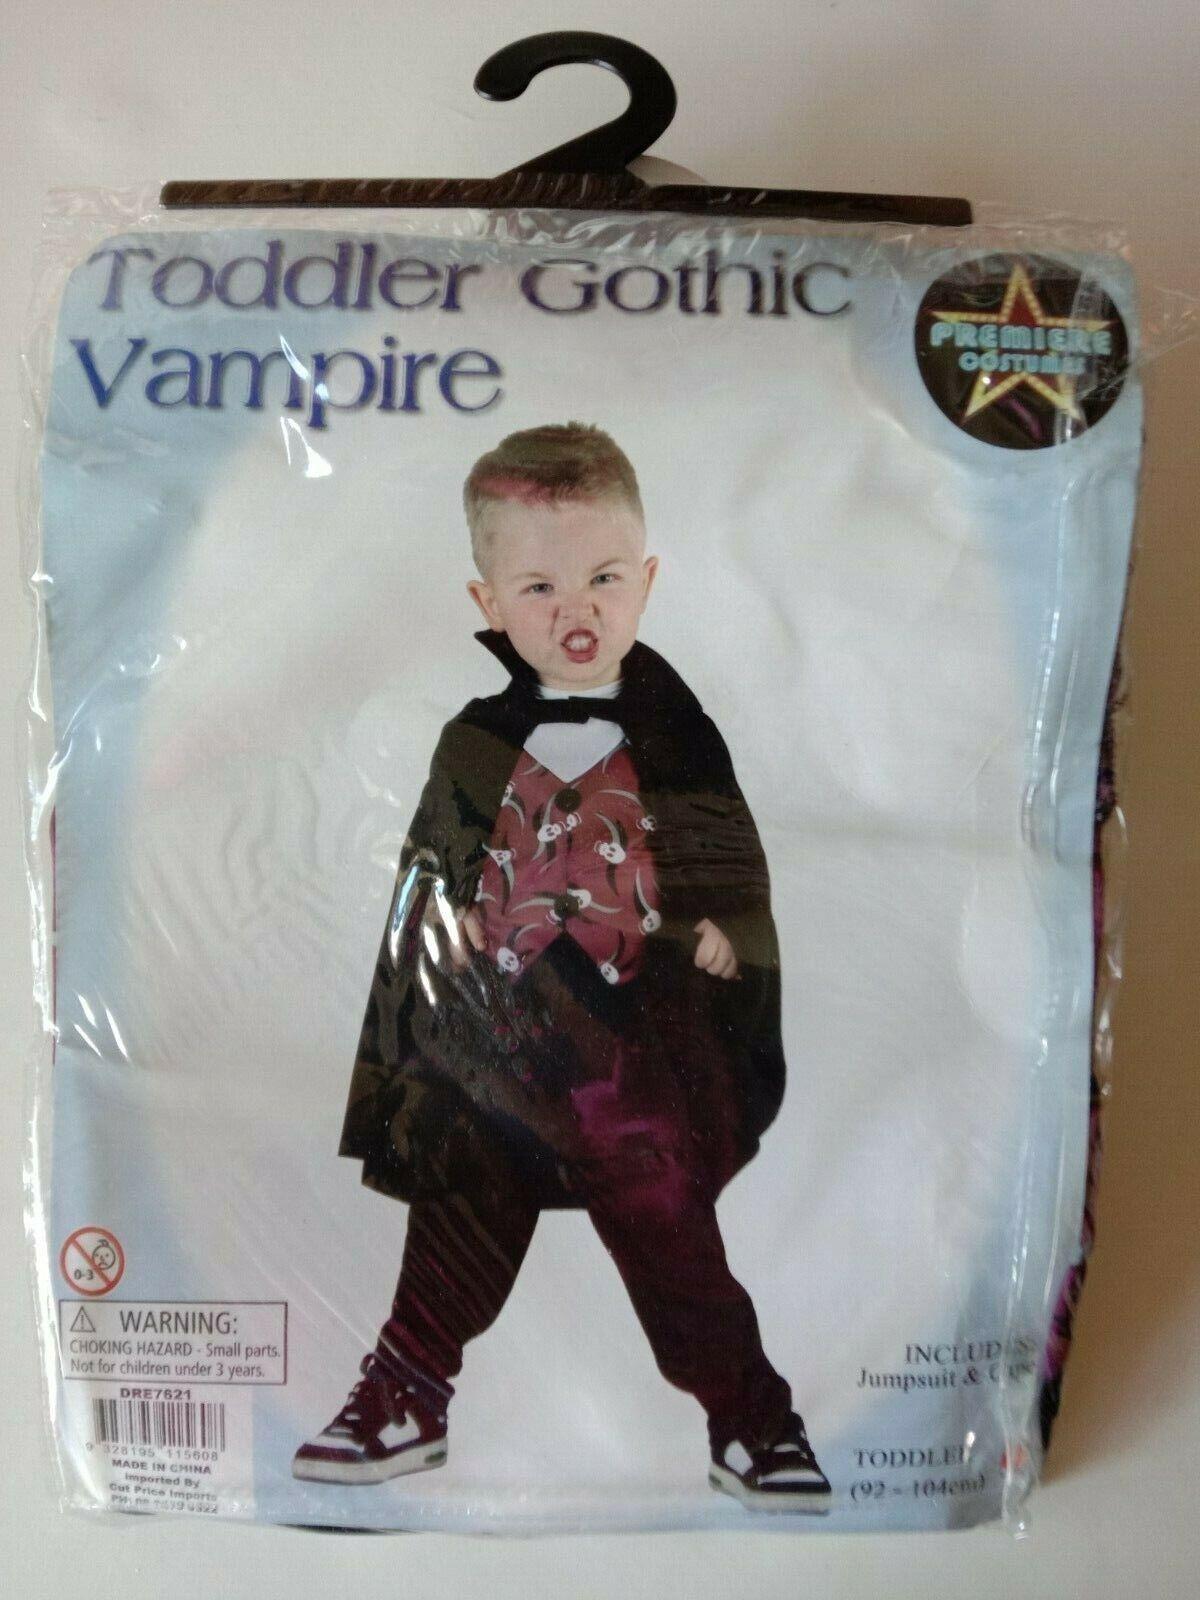 TODDLER GOTHIC VAMPIRE (92-104cm)